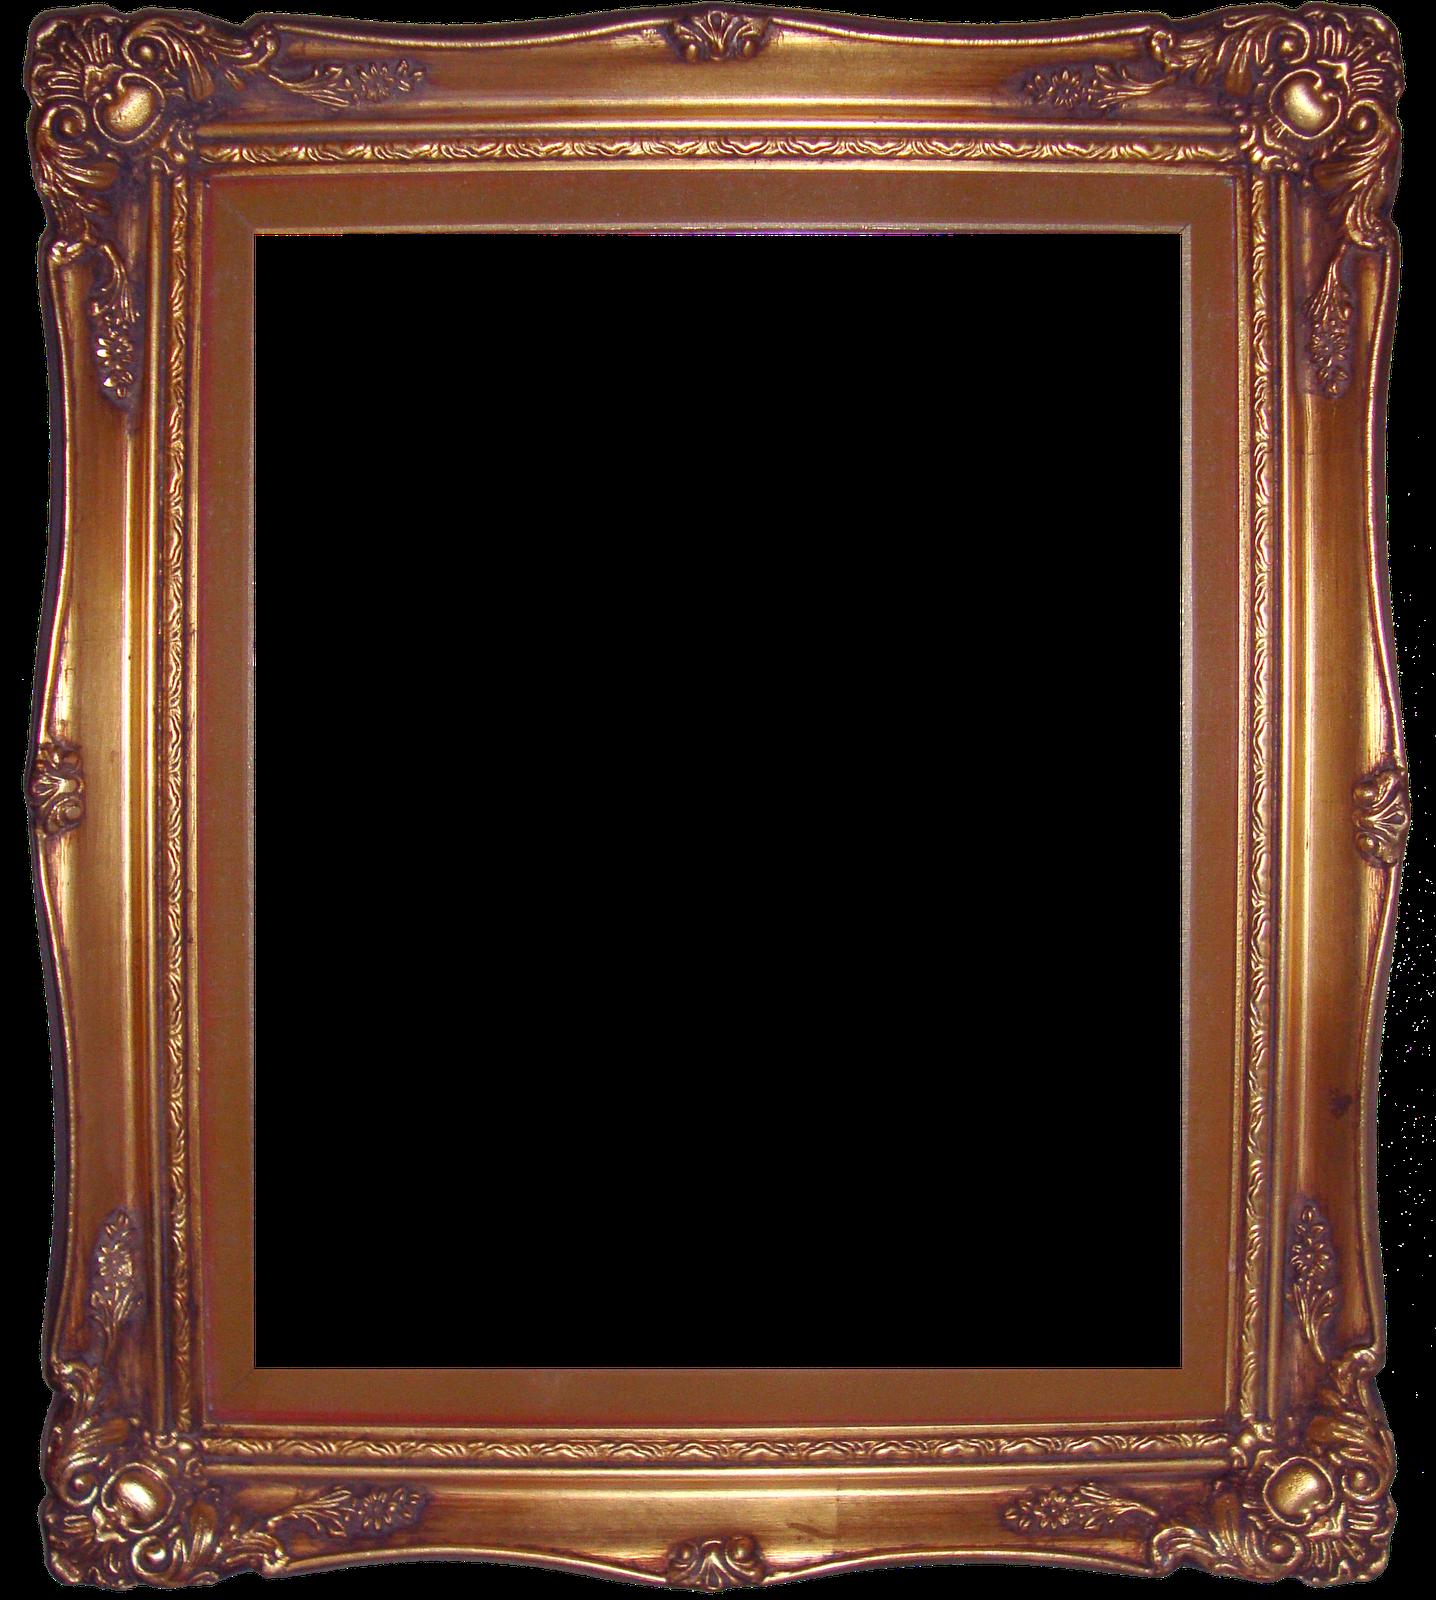 Free Digital Antique Photo Frames Antique Photo Frames Digital